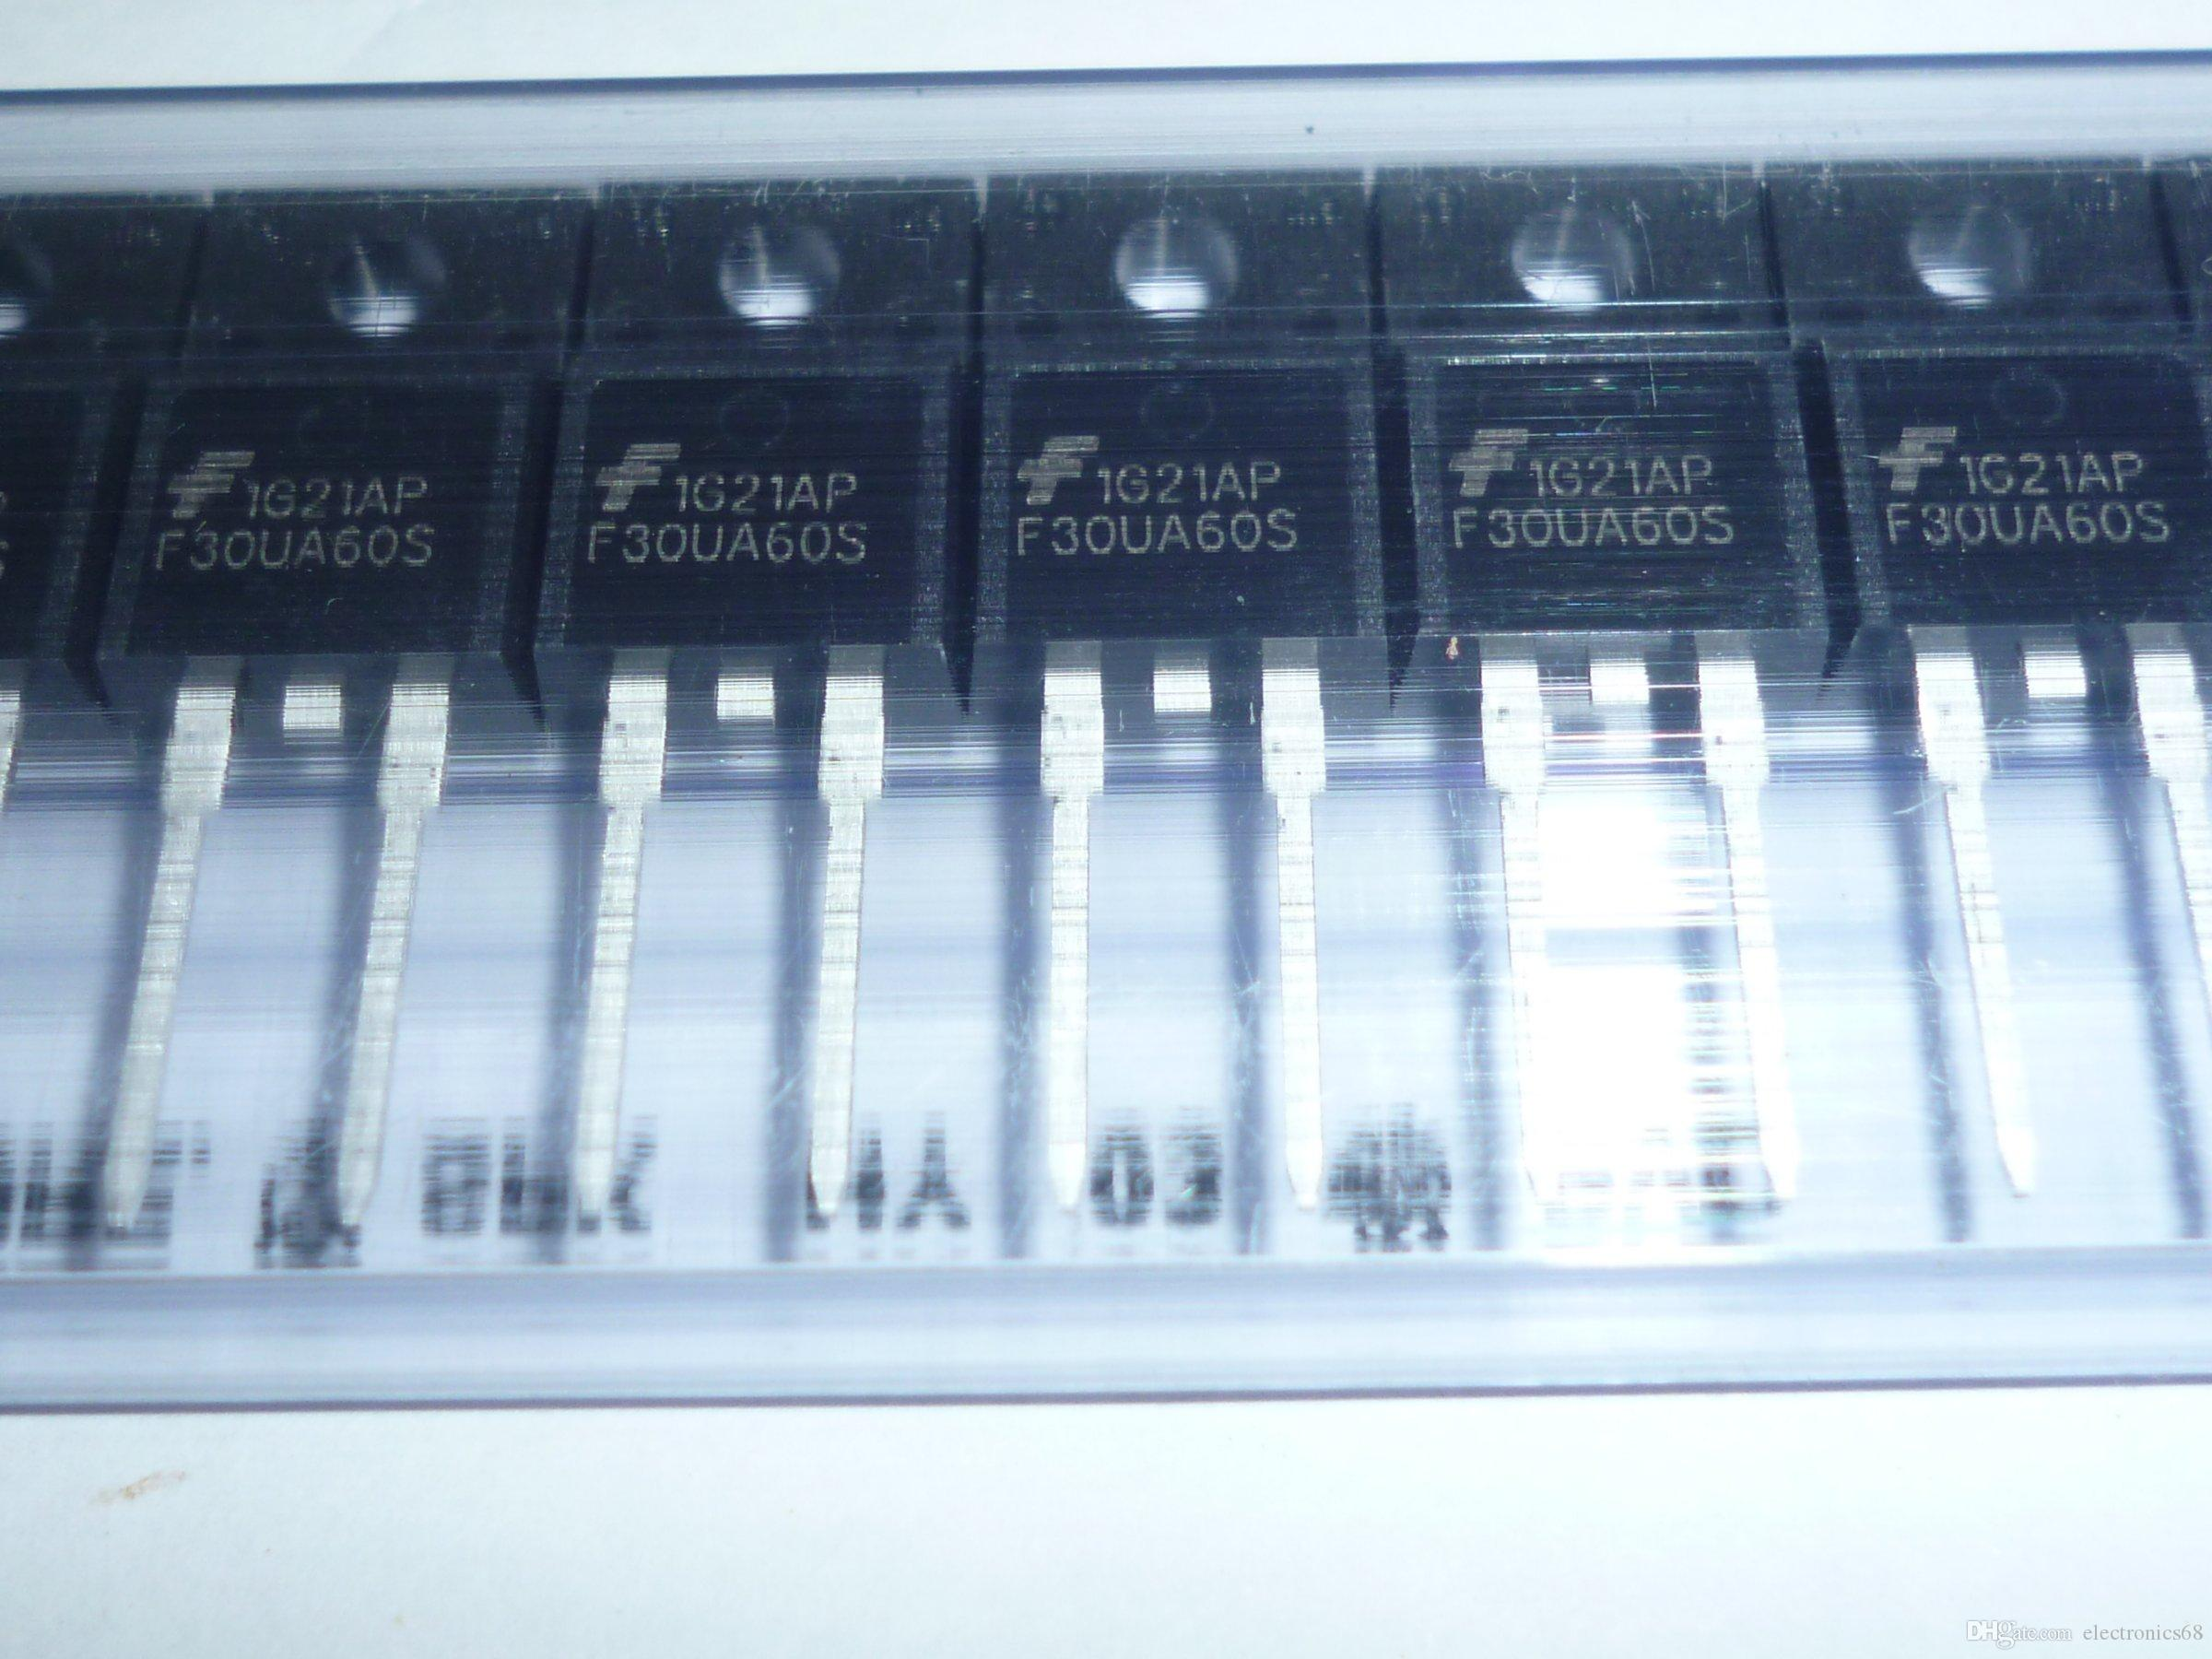 FFPF30UA60S F30UA60S DIODE GEN PURP 600V 30A TO220-2 Dioden Gleichrichter Single